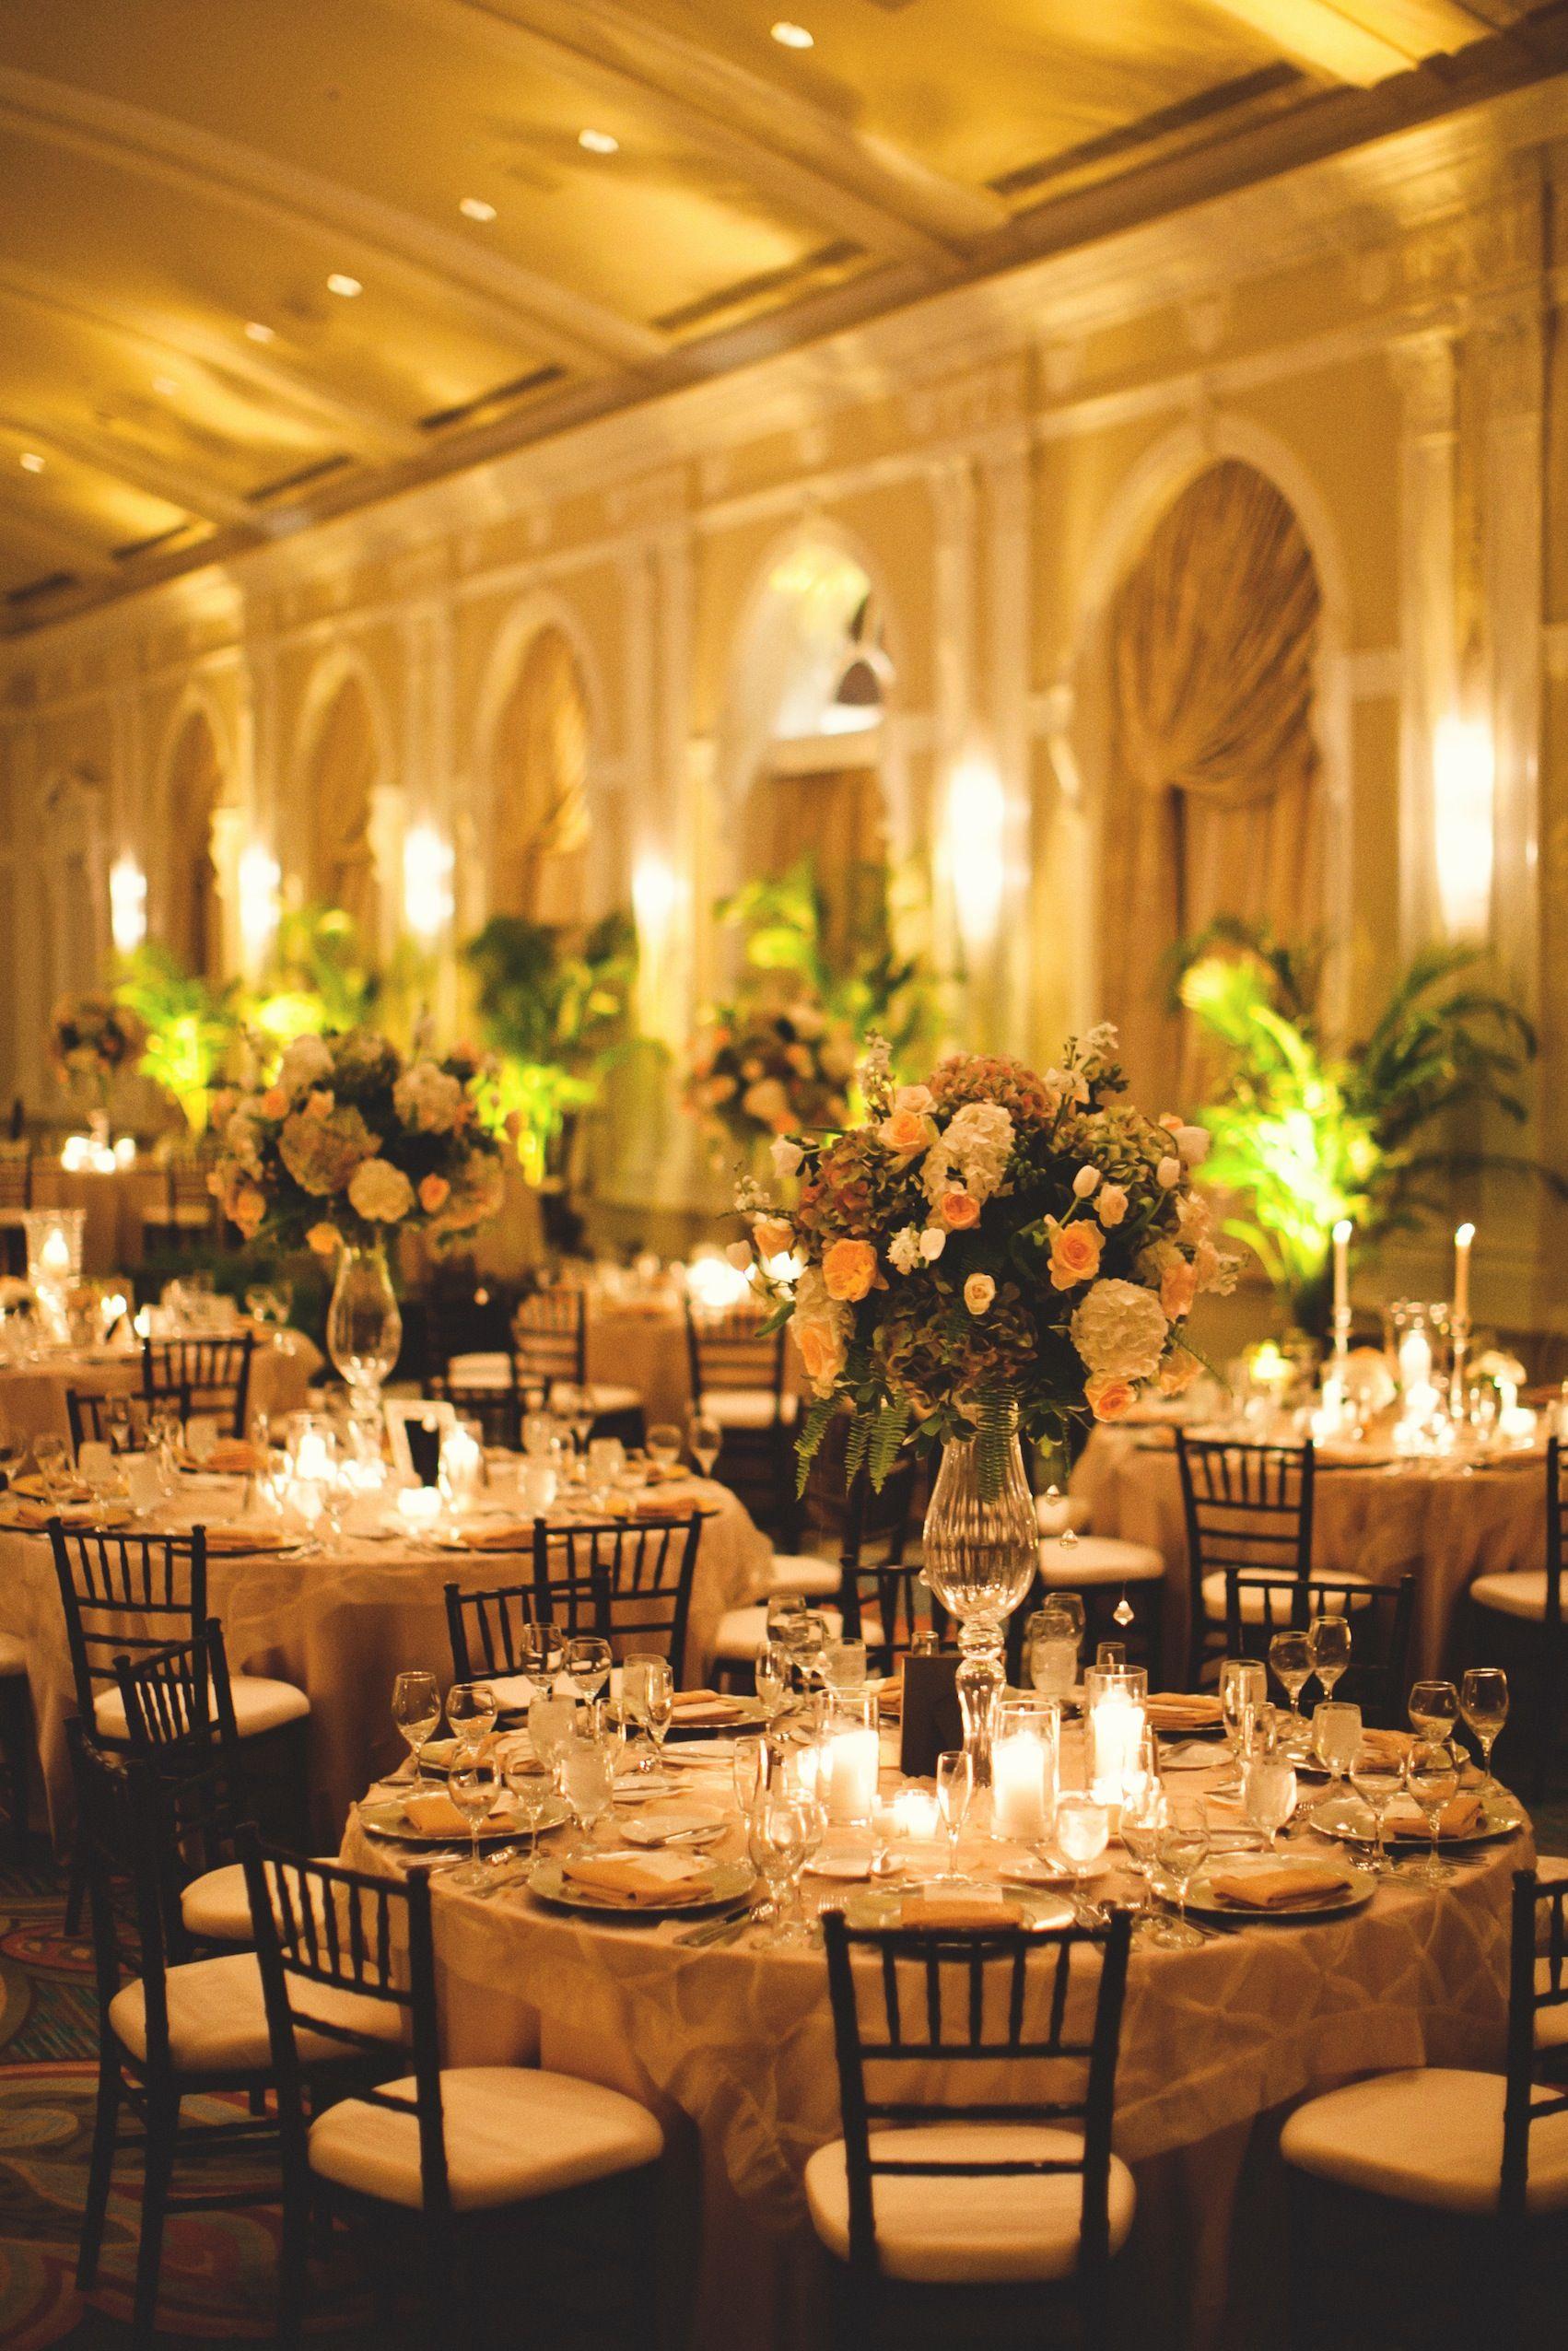 Decor And Floral Botanica Grand Ballroom Wedding